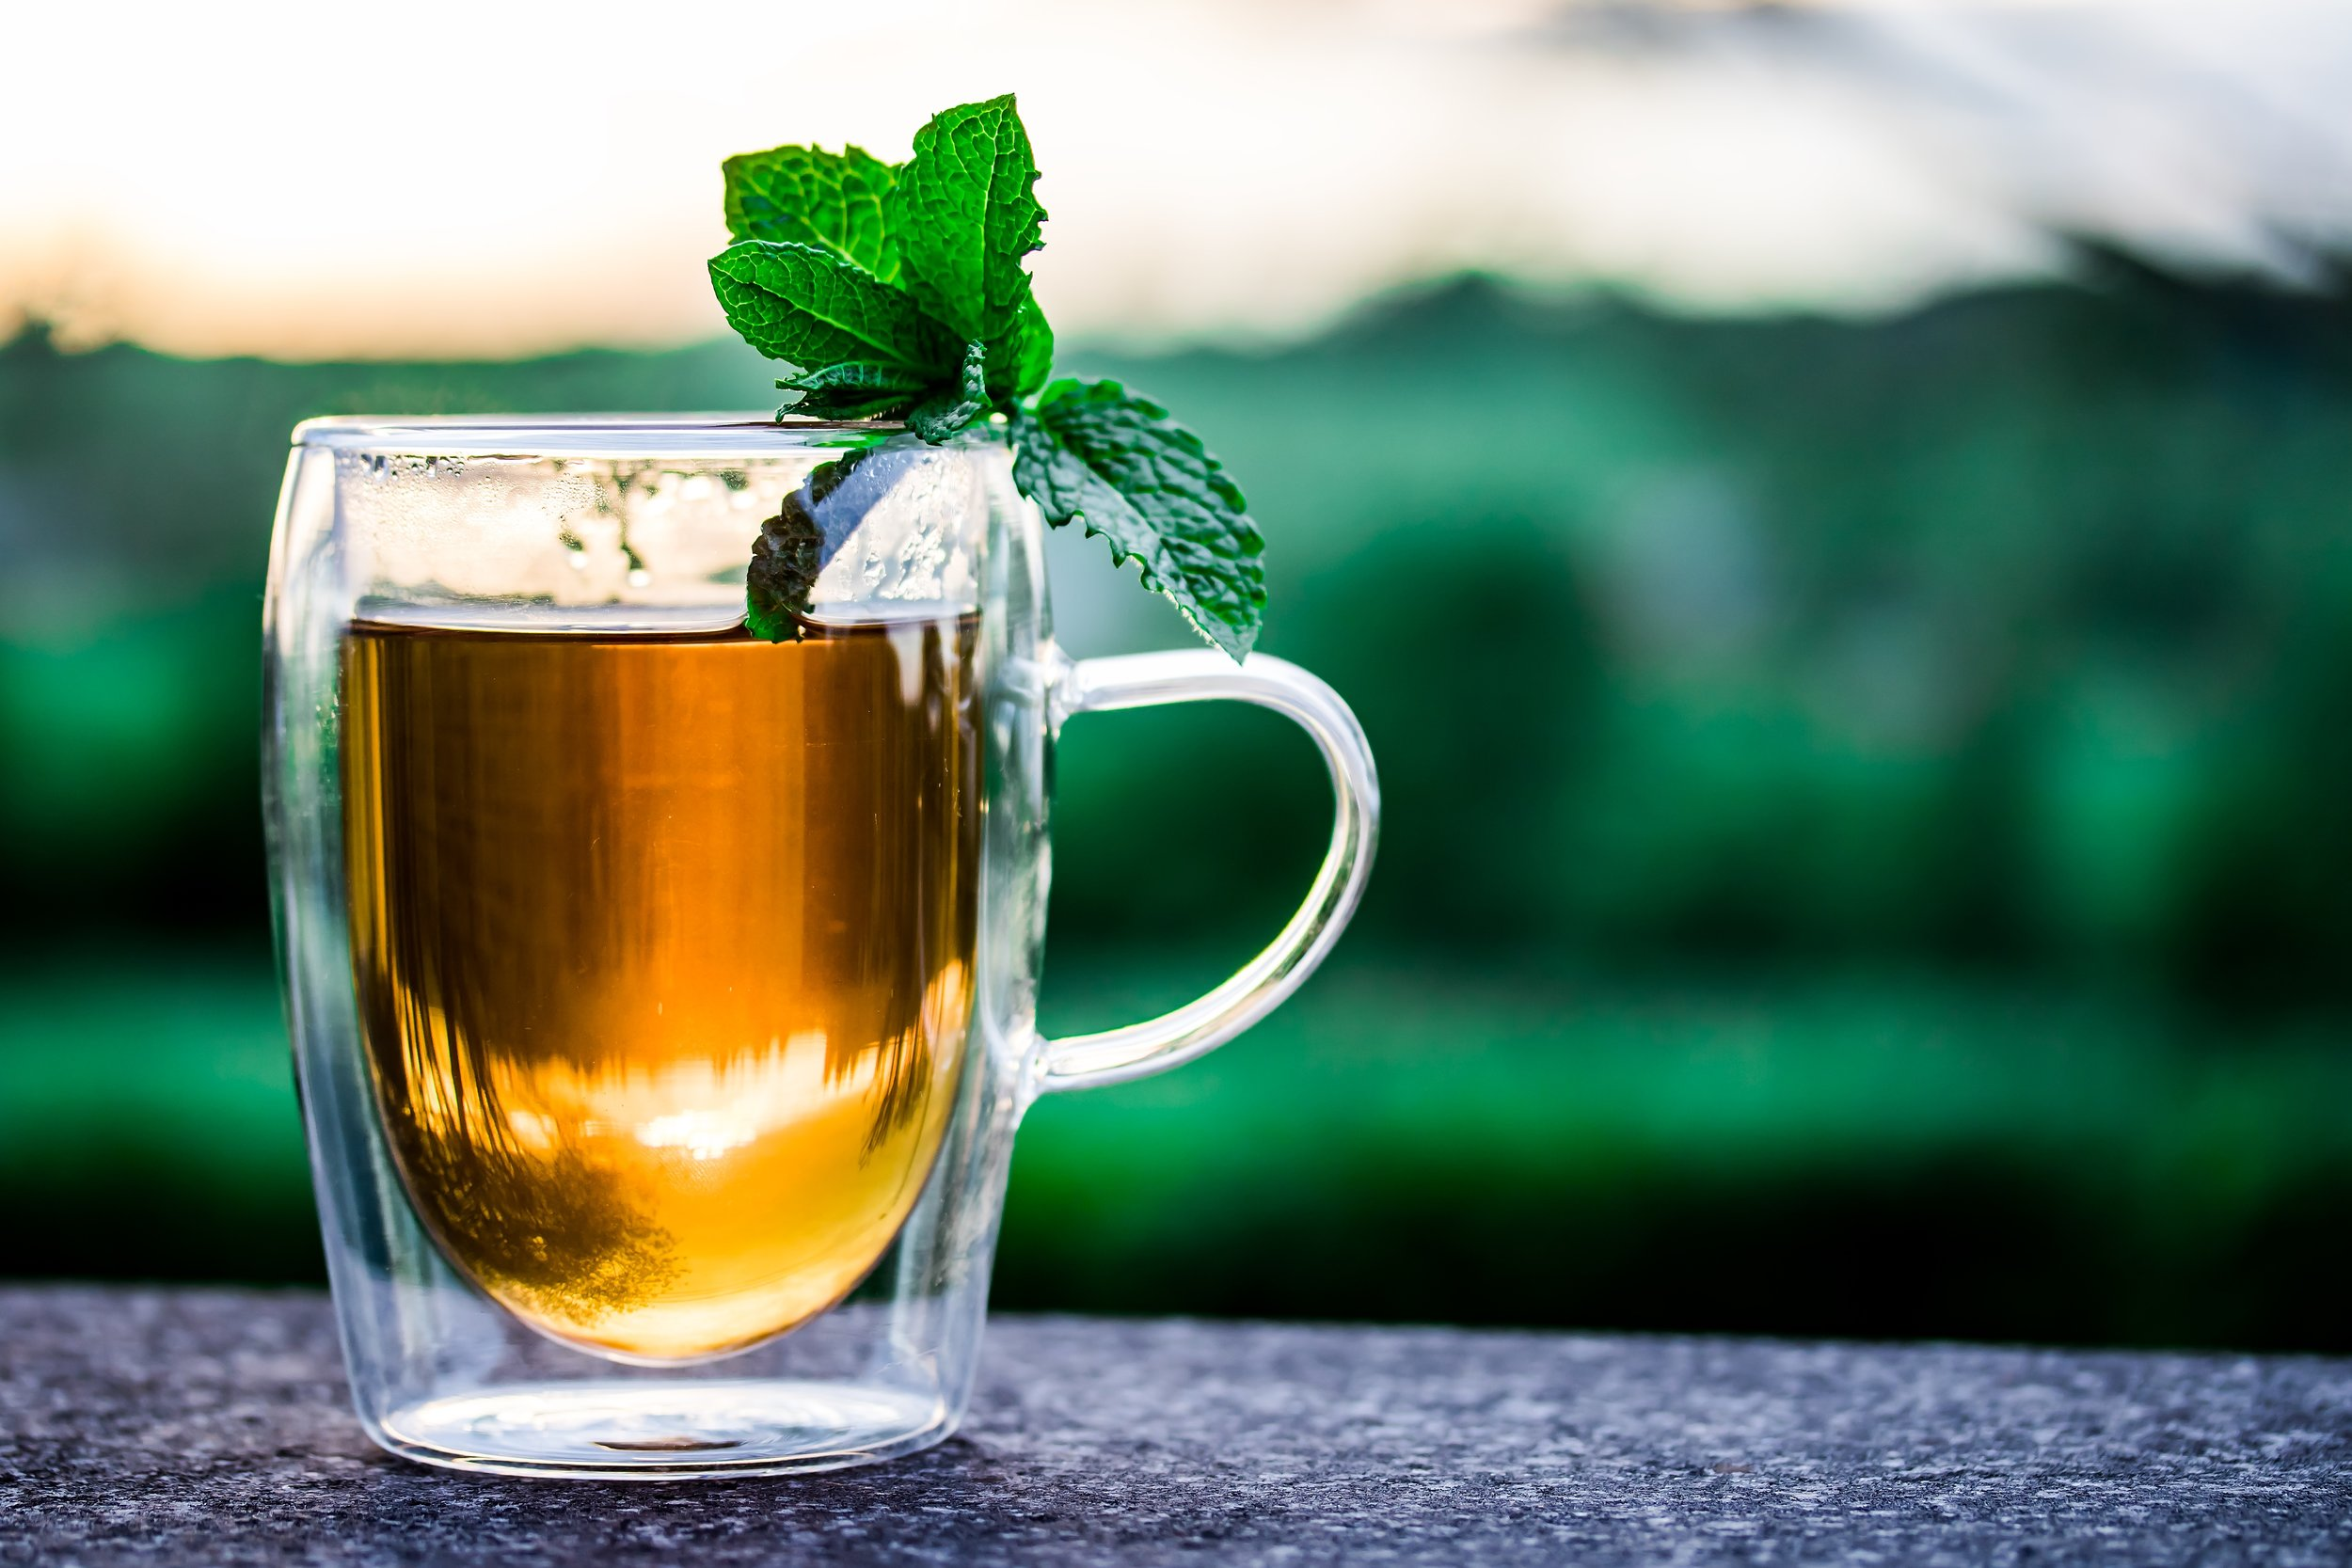 teacup-cup-of-tea-tee-drink-428615.jpeg